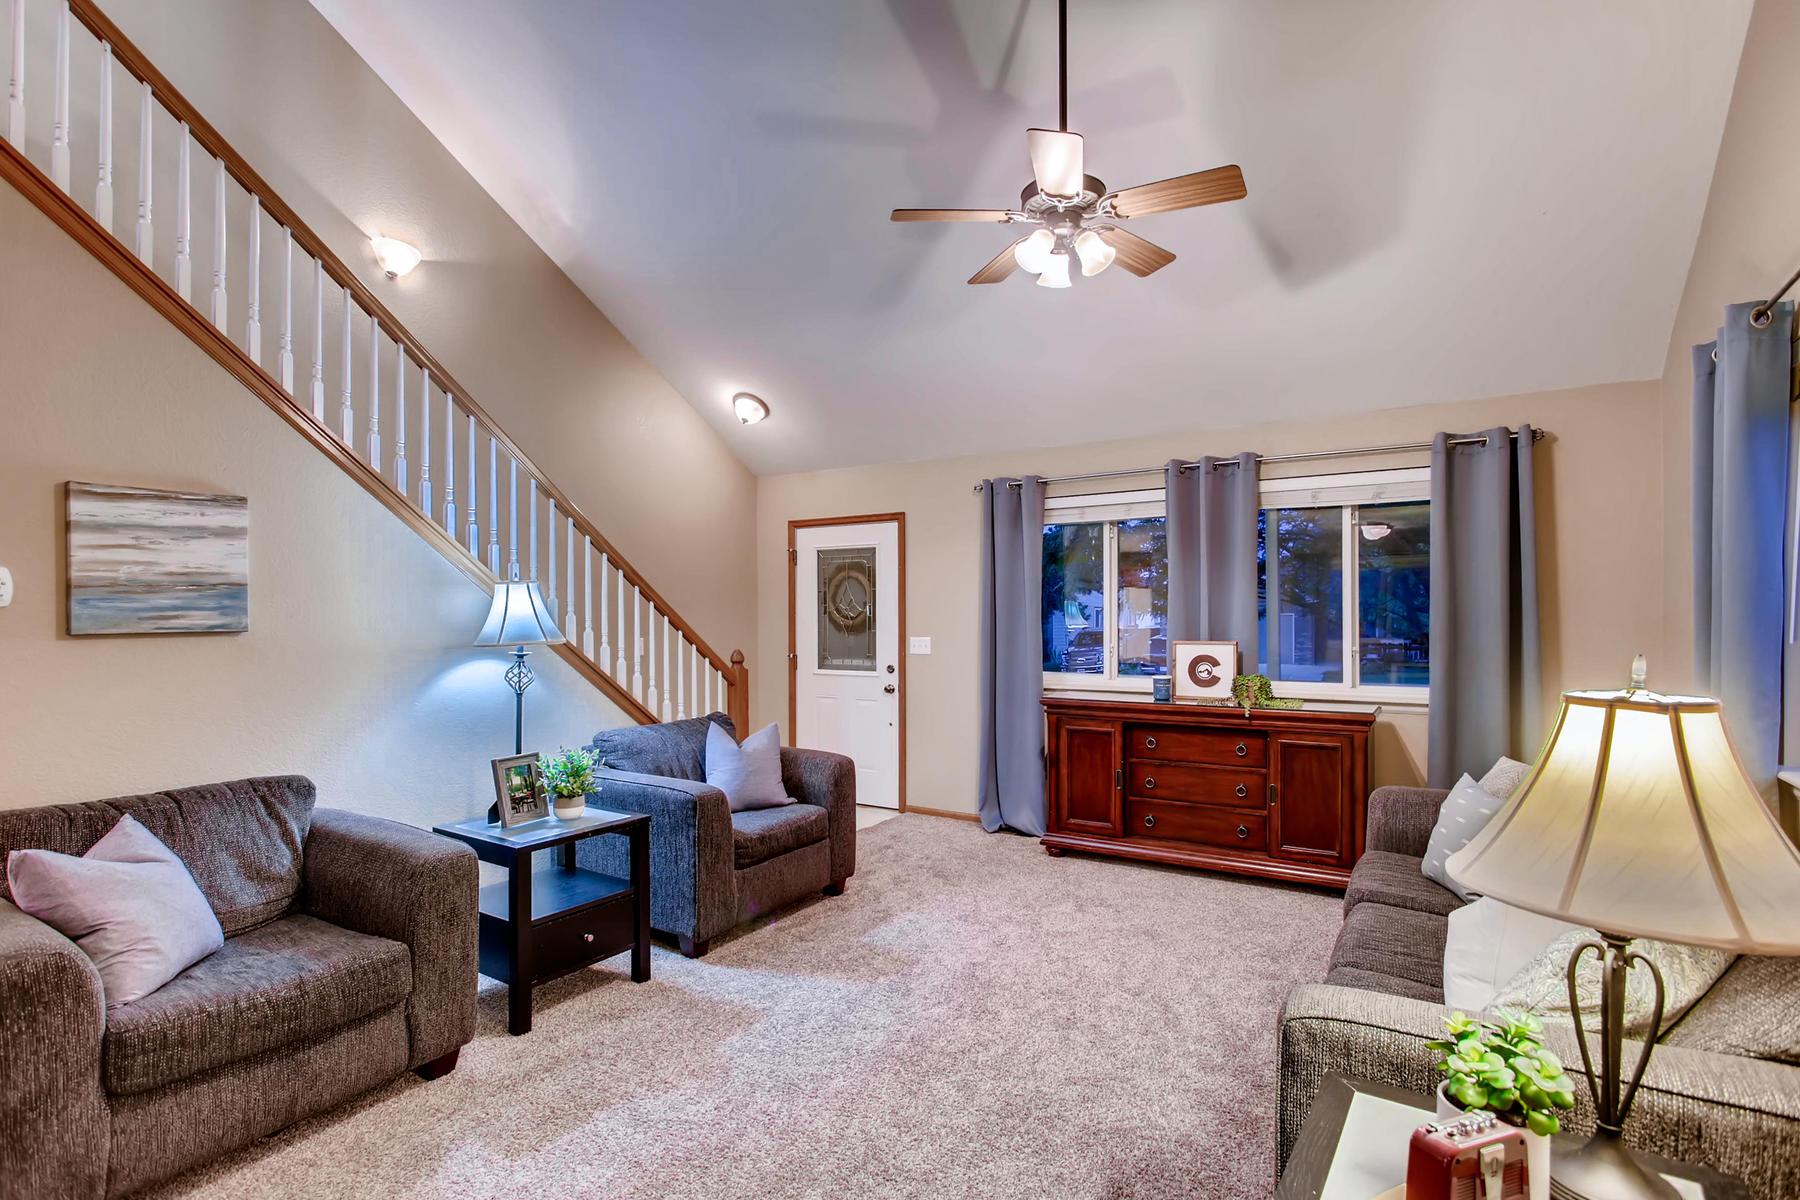 863 Eagle Dr Loveland CO 80537-005-018-Living Room-MLS_Size.jpg